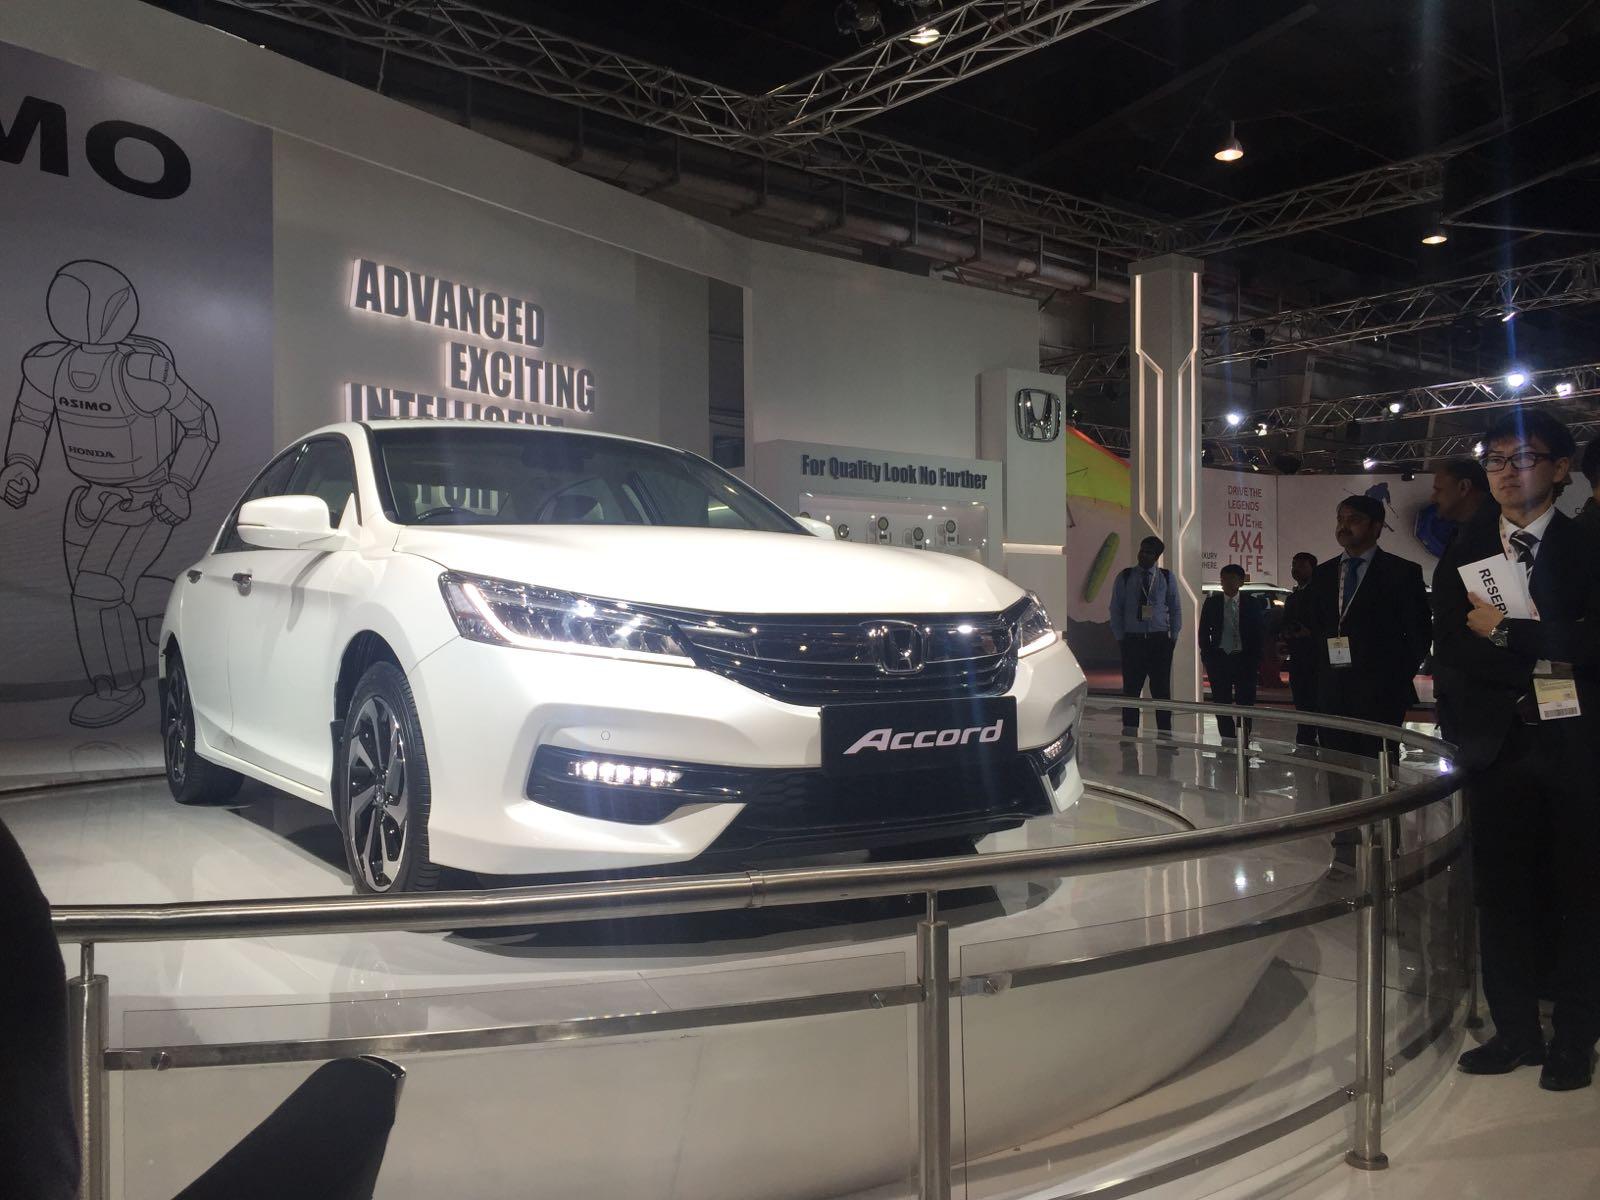 Honda Accord New Model Photos Front Angle